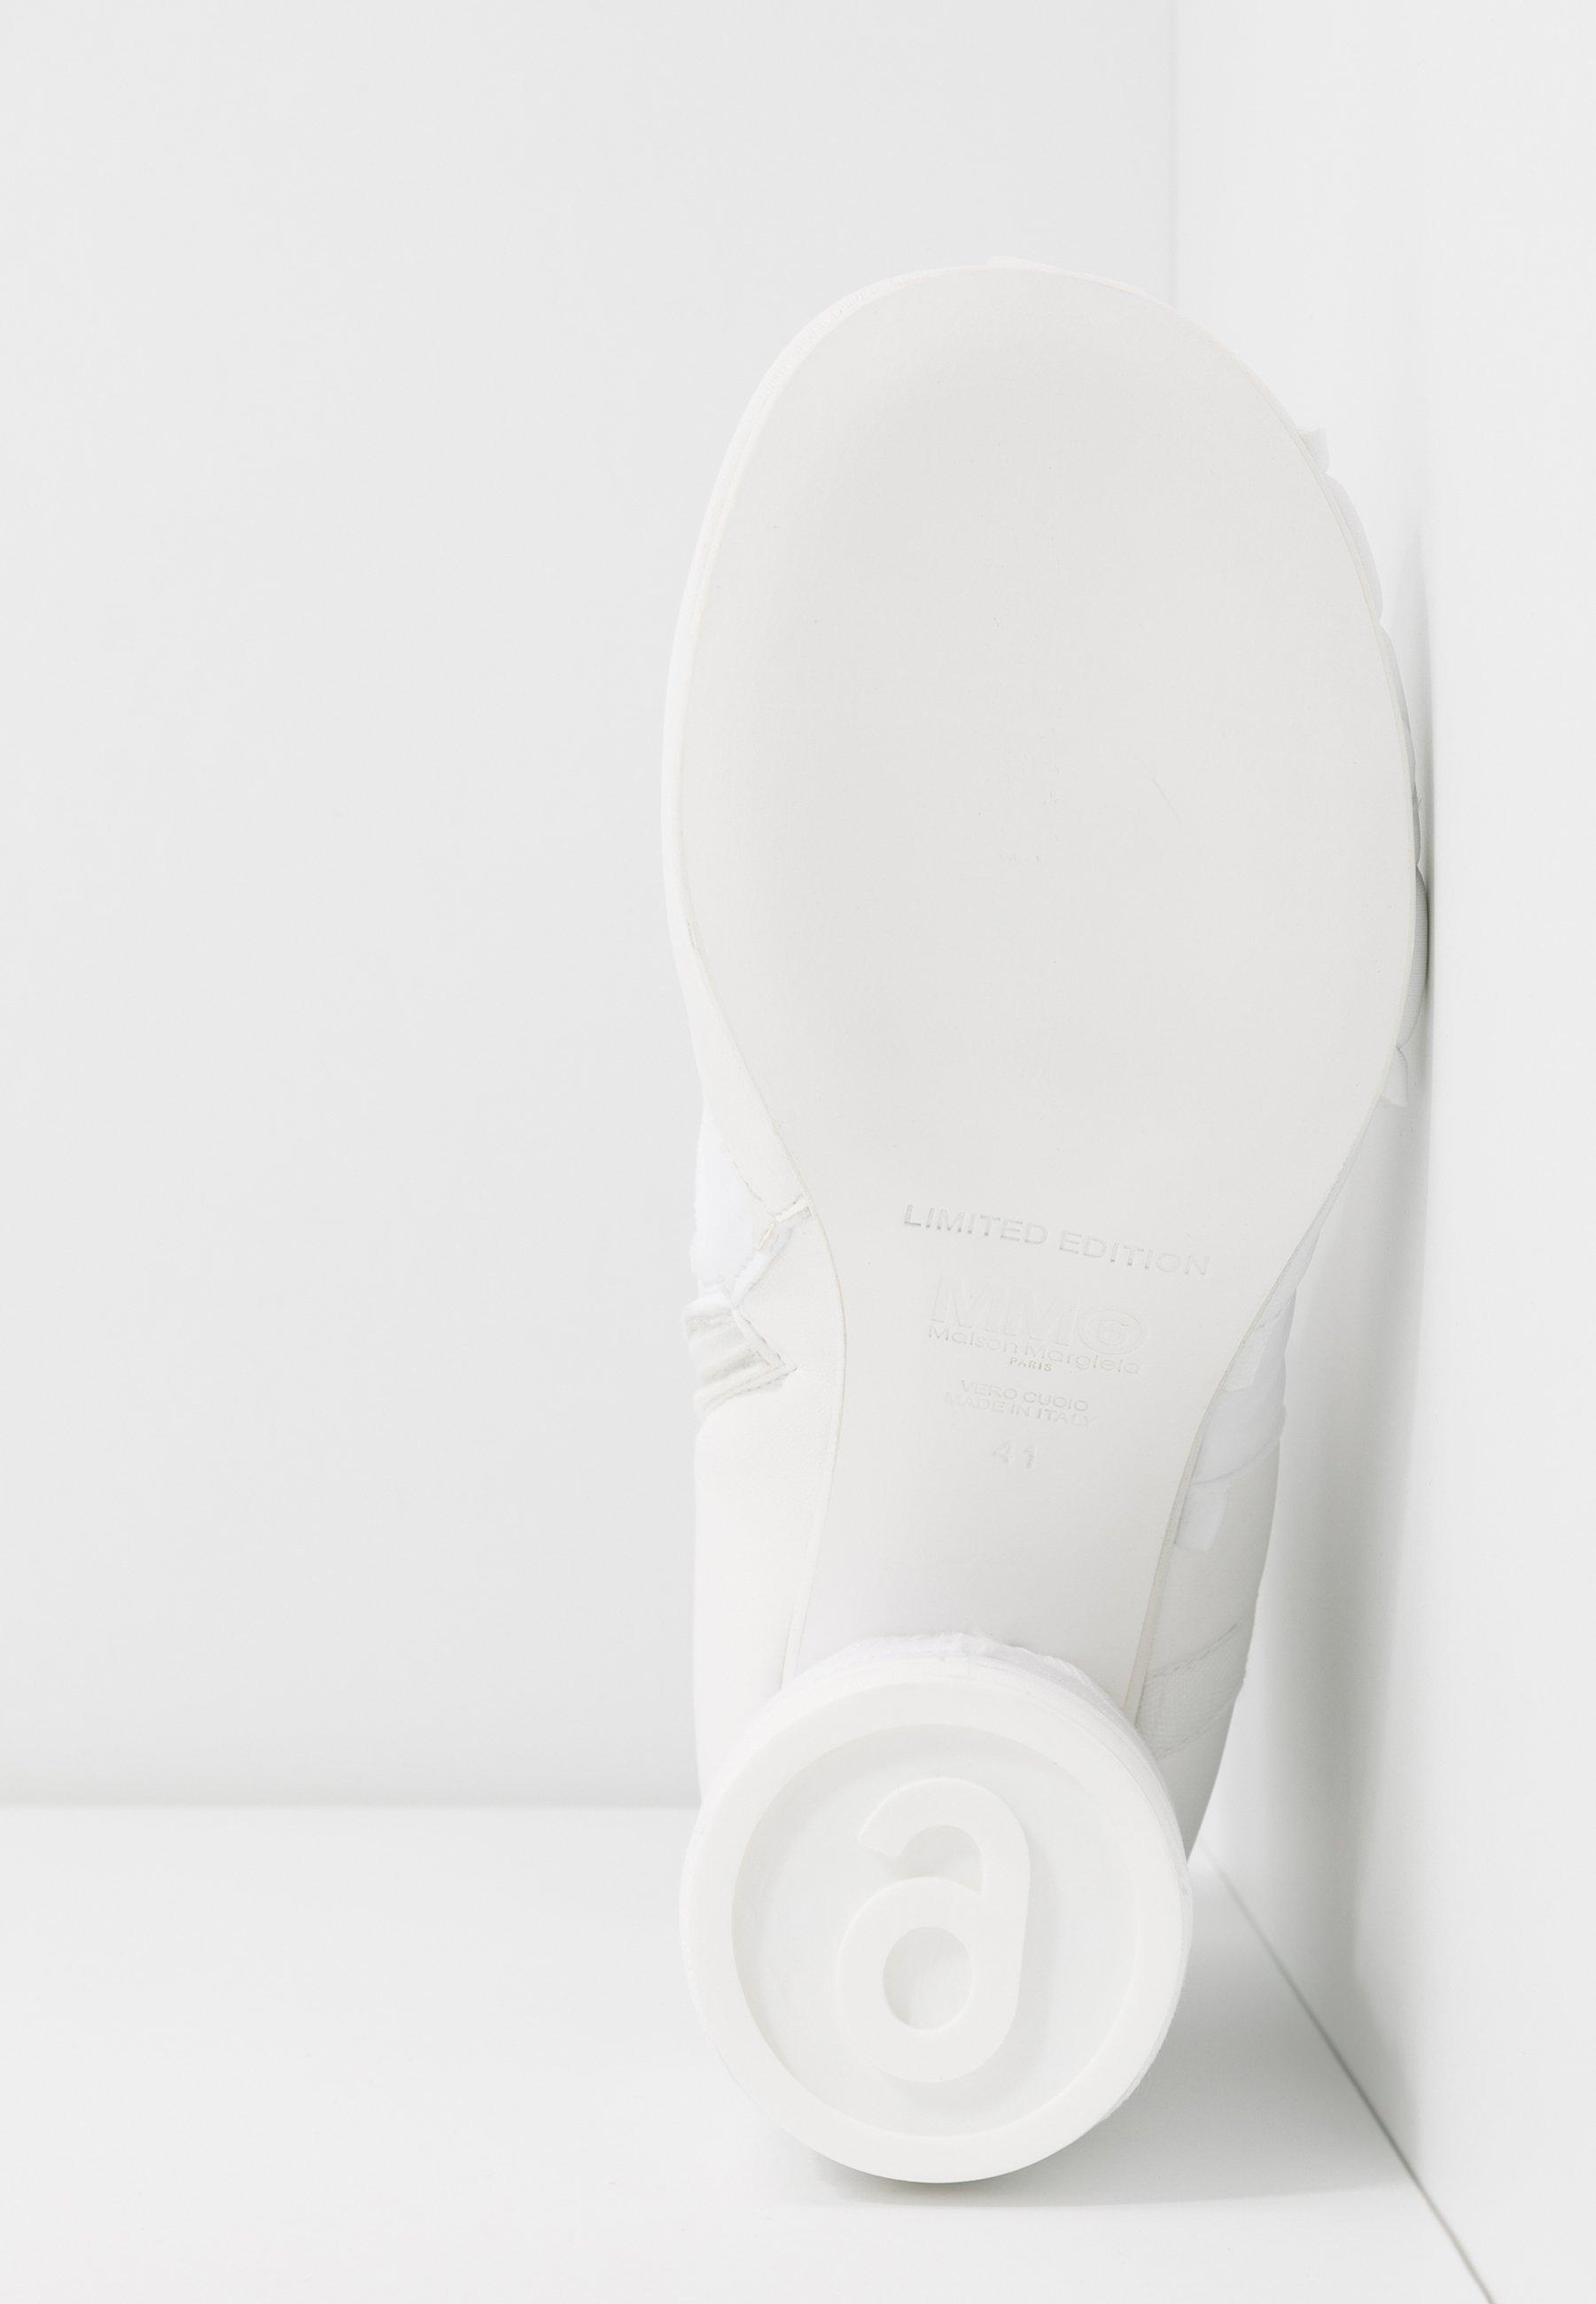 MM6 Maison Margiela Bottines à talons hauts - white